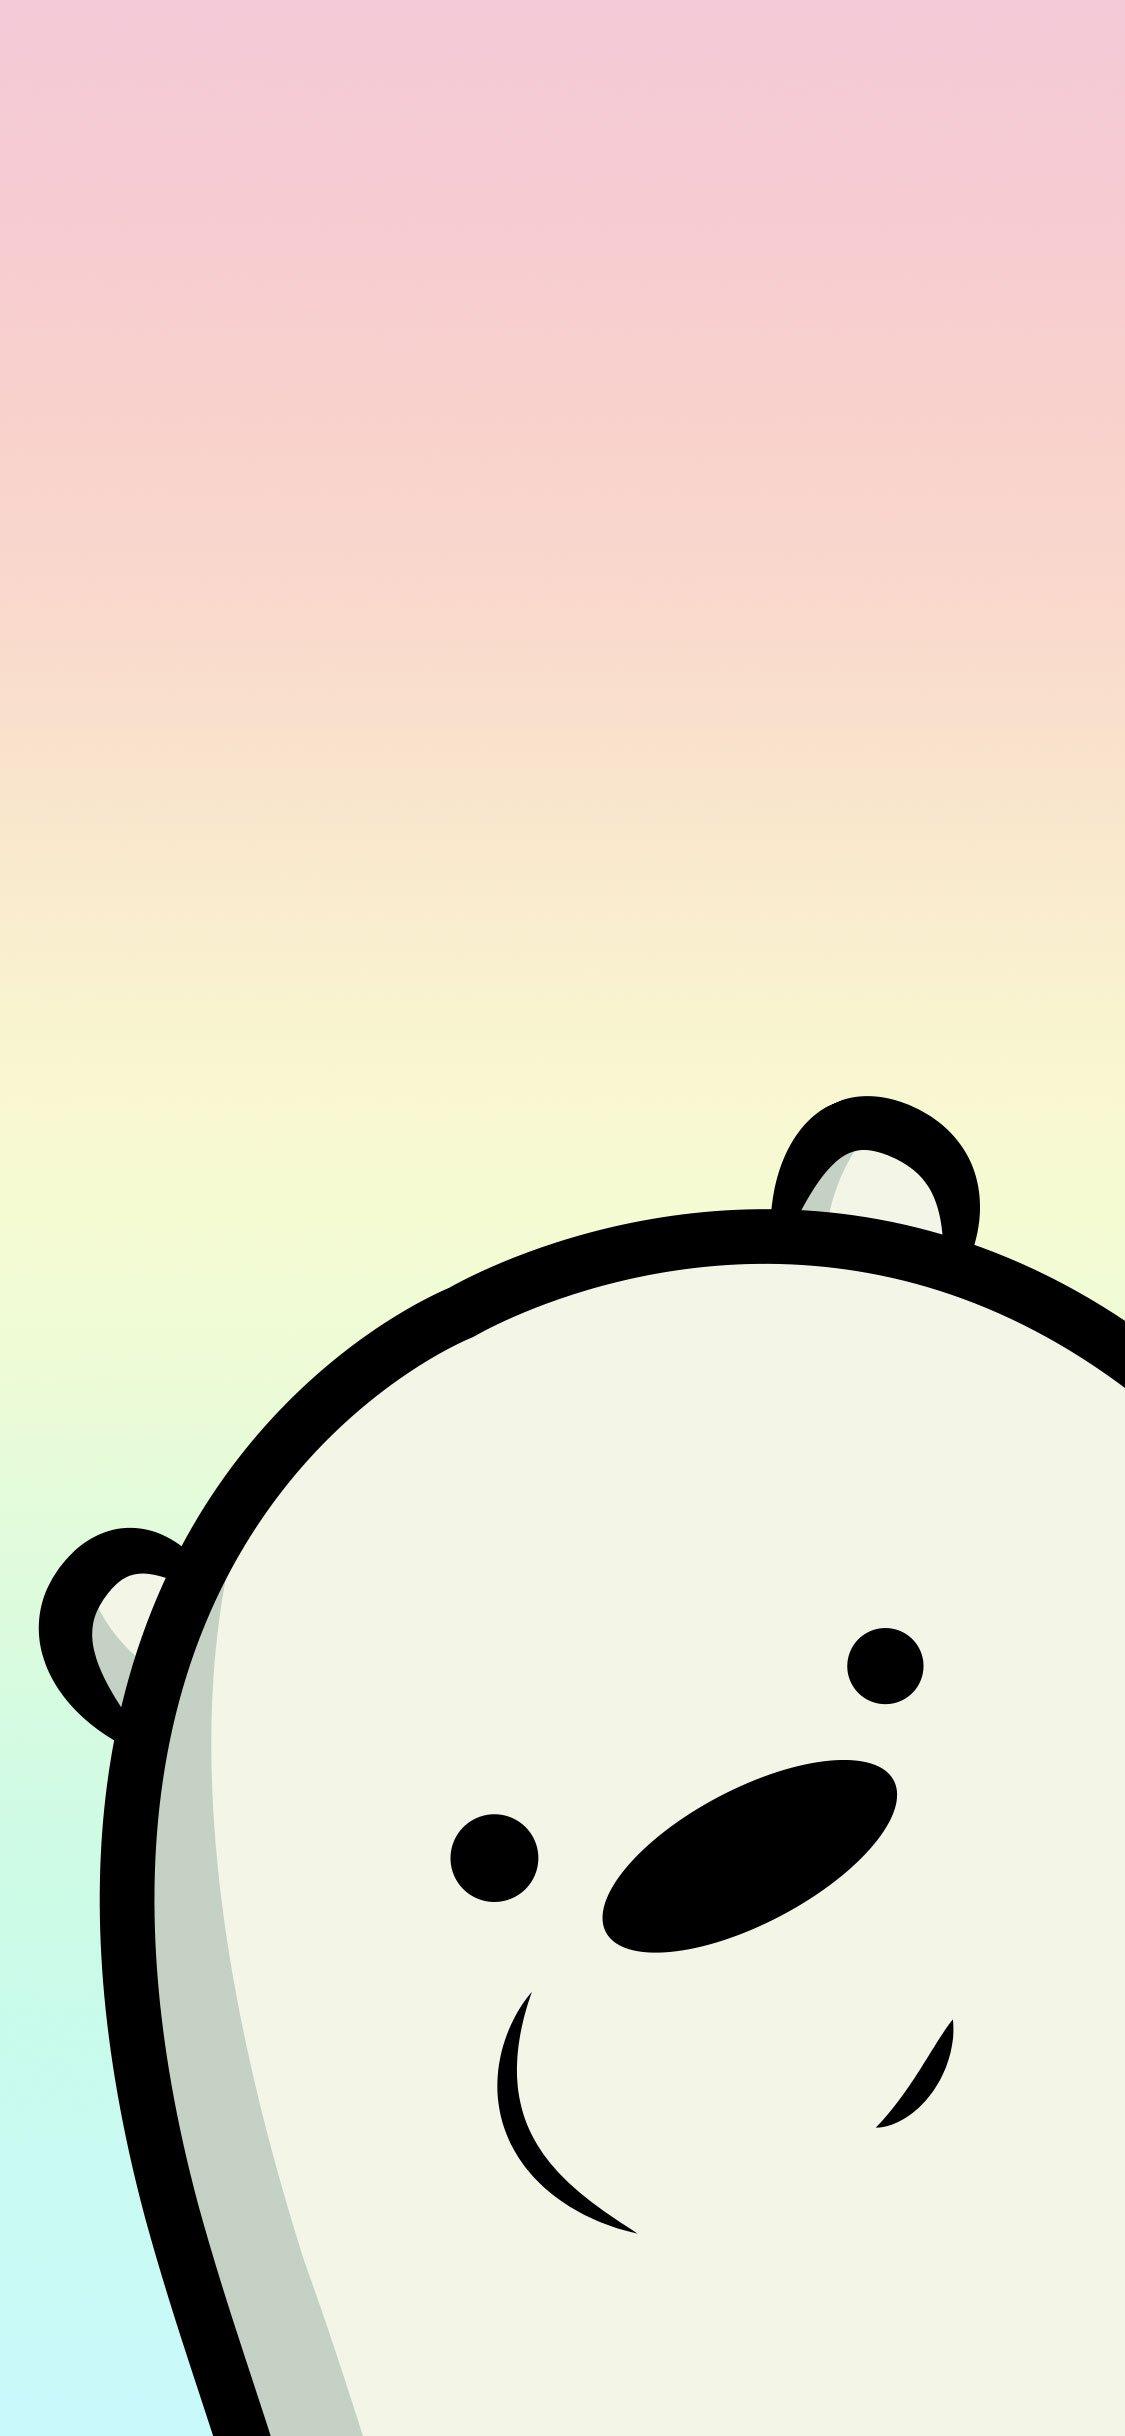 We Bare Bears samsung iphone google pixel Wallpapers 9